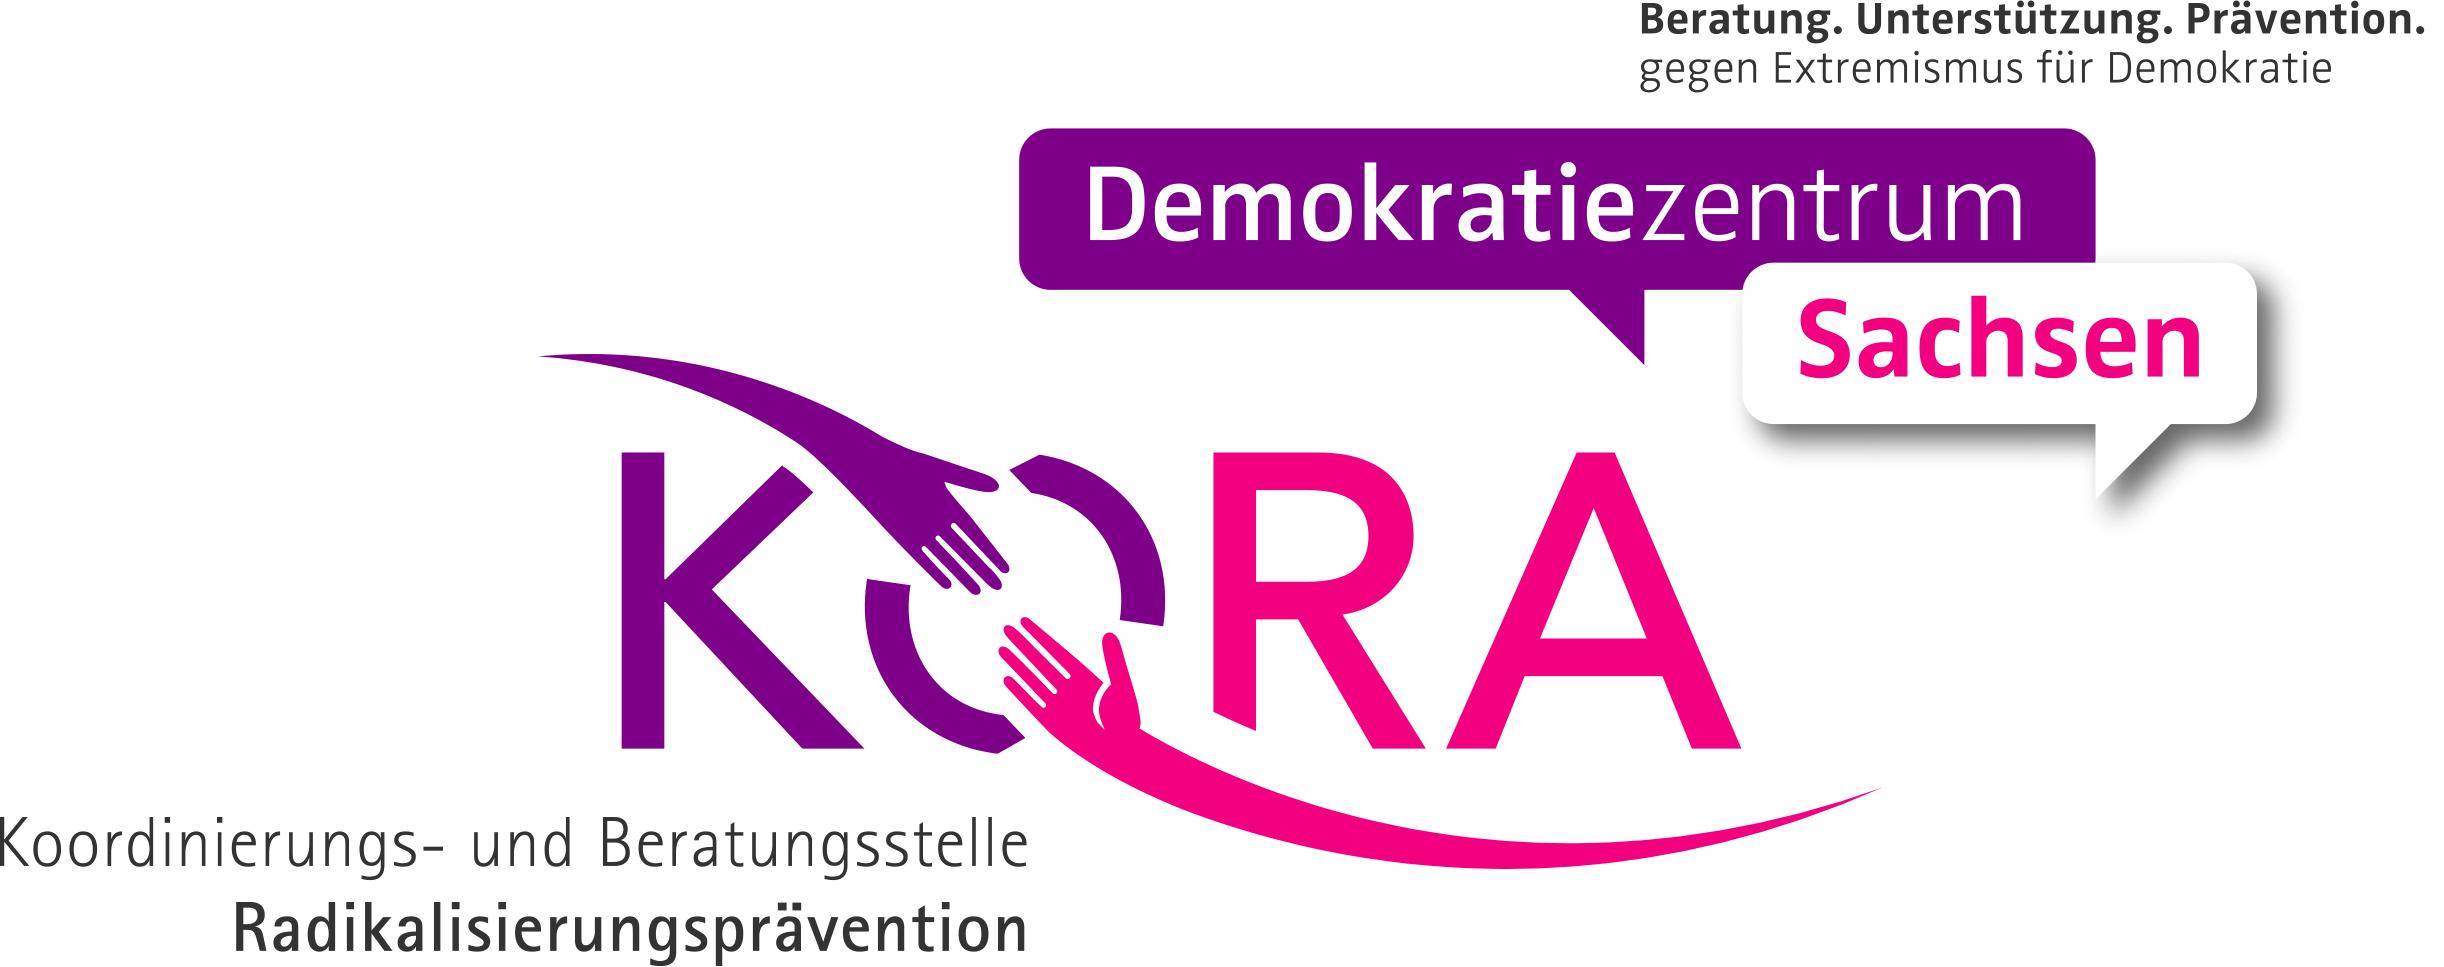 KORA Demokratiezentrum Sachsen Logo